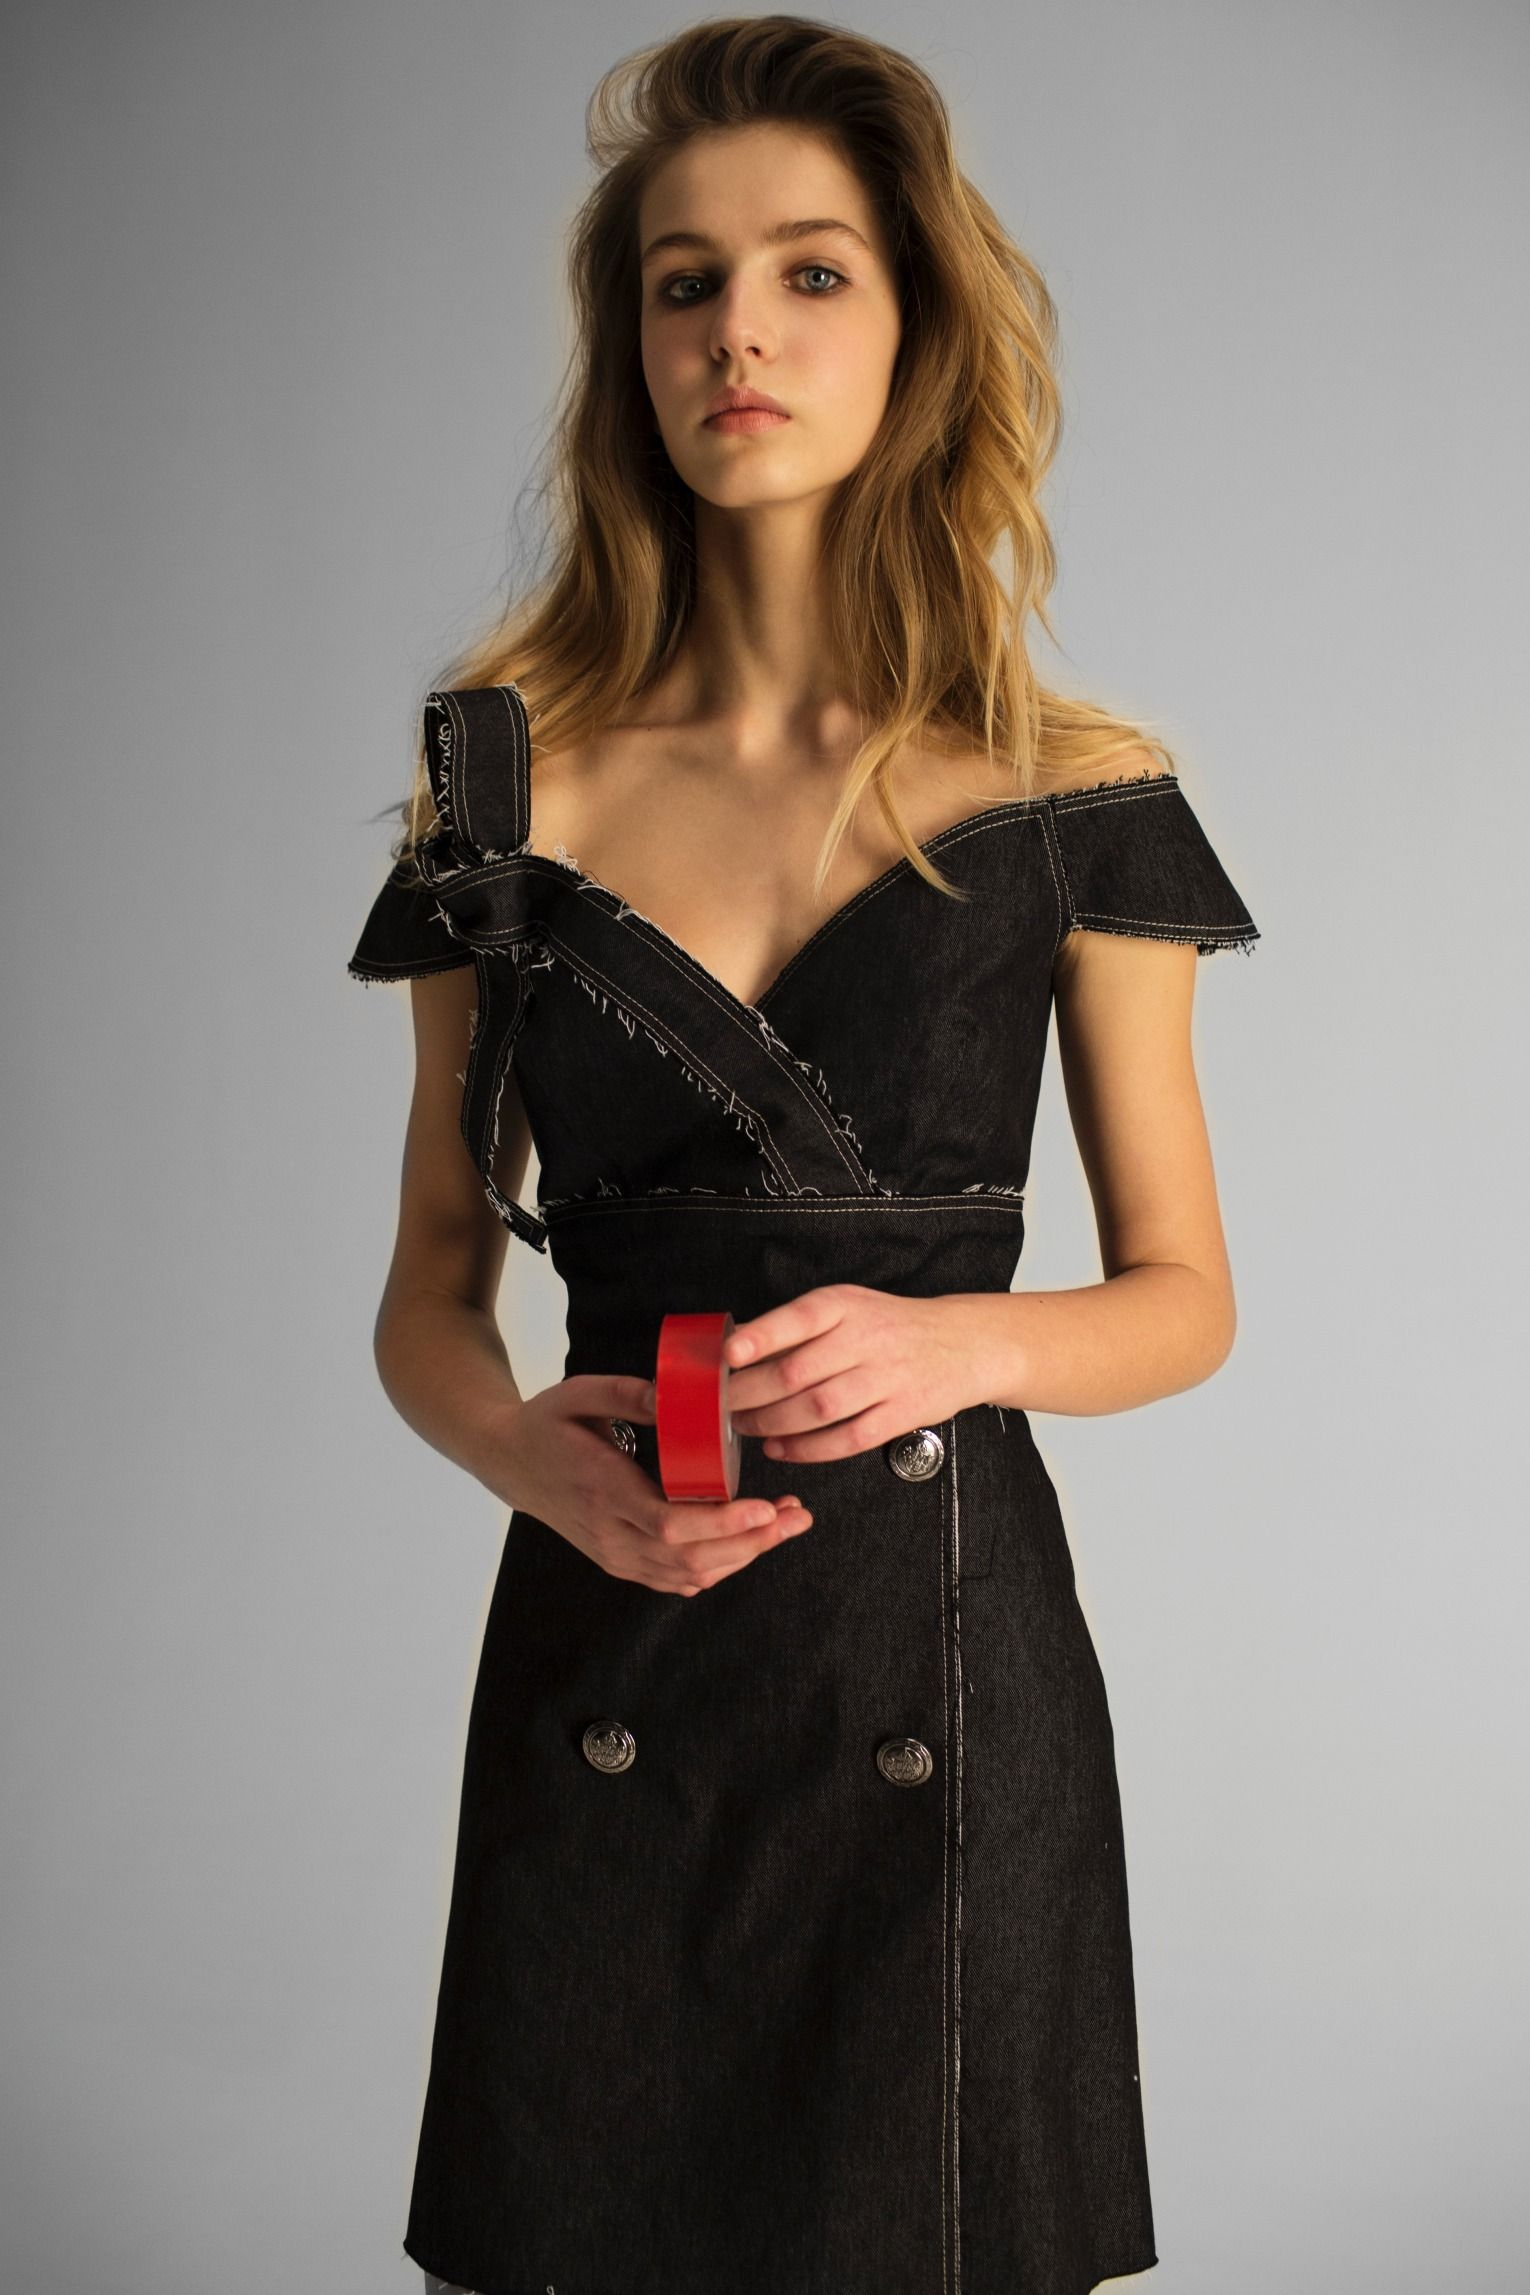 Off the Shoulder Denim dress by Klamanovich Moda